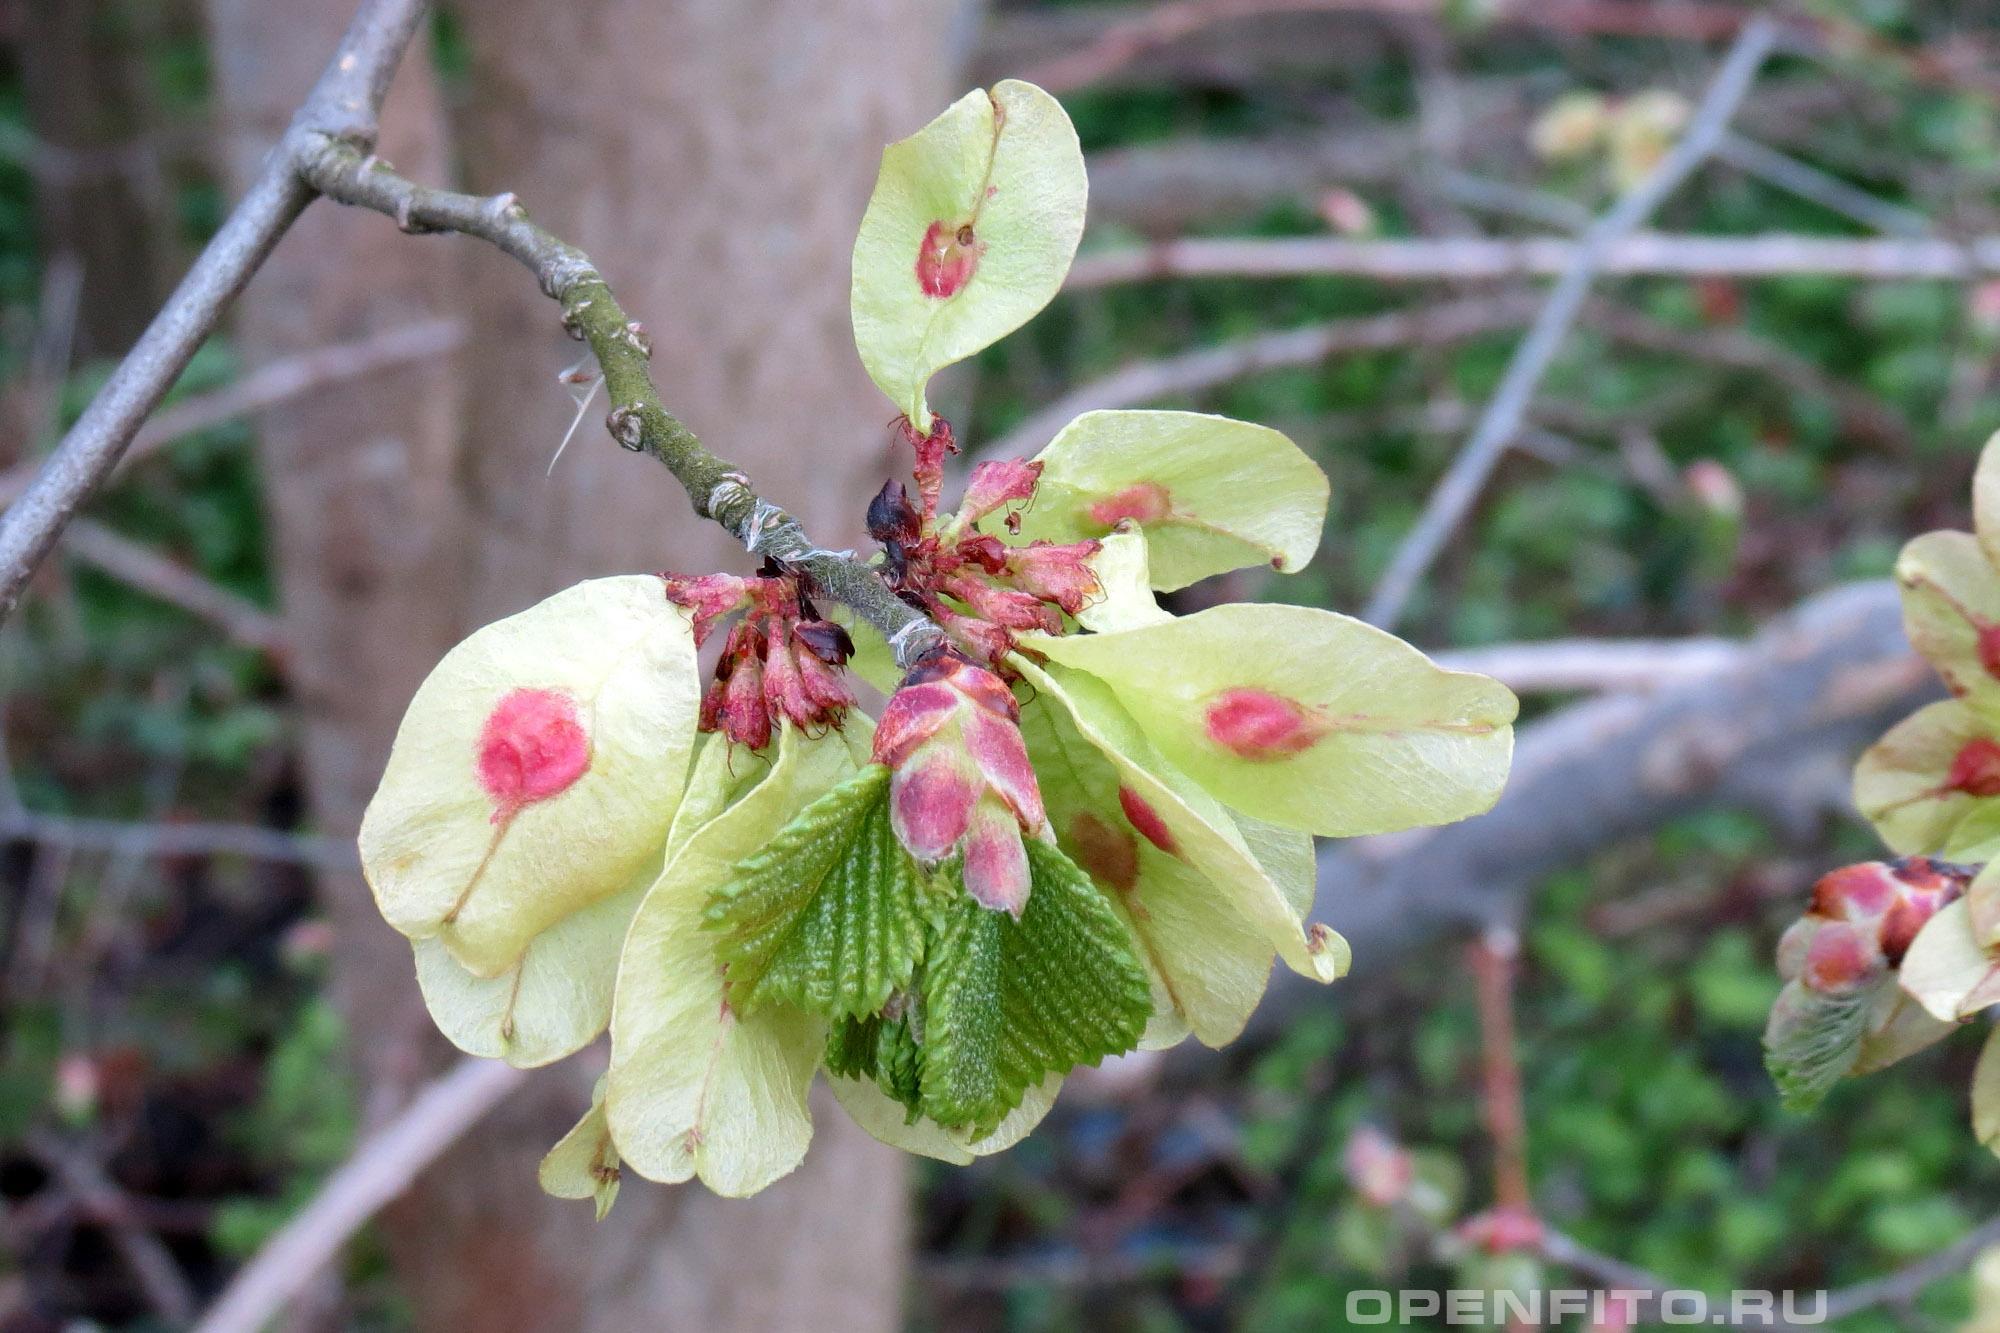 Вяз голый верхушка побега с плодами